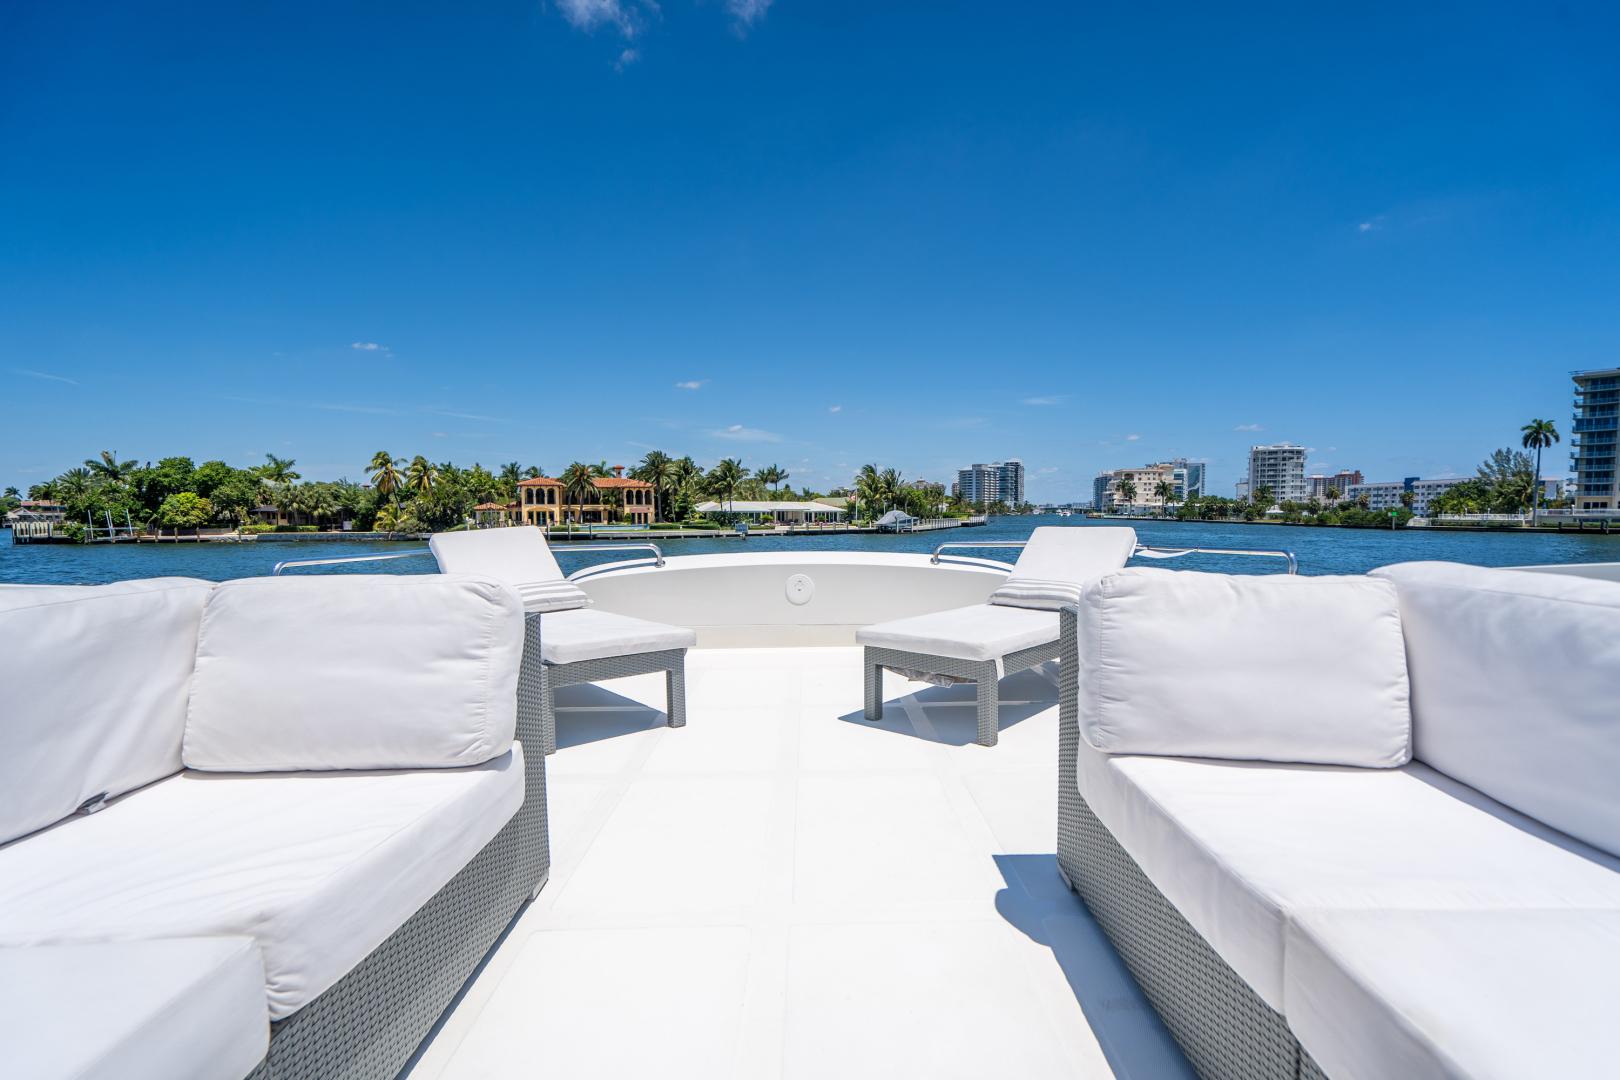 Overblue-58 Power Catamaran 2017-Techuila Ft. Lauderdale-Florida-United States-2017 Overblue 58 Powercat-1401265   Thumbnail